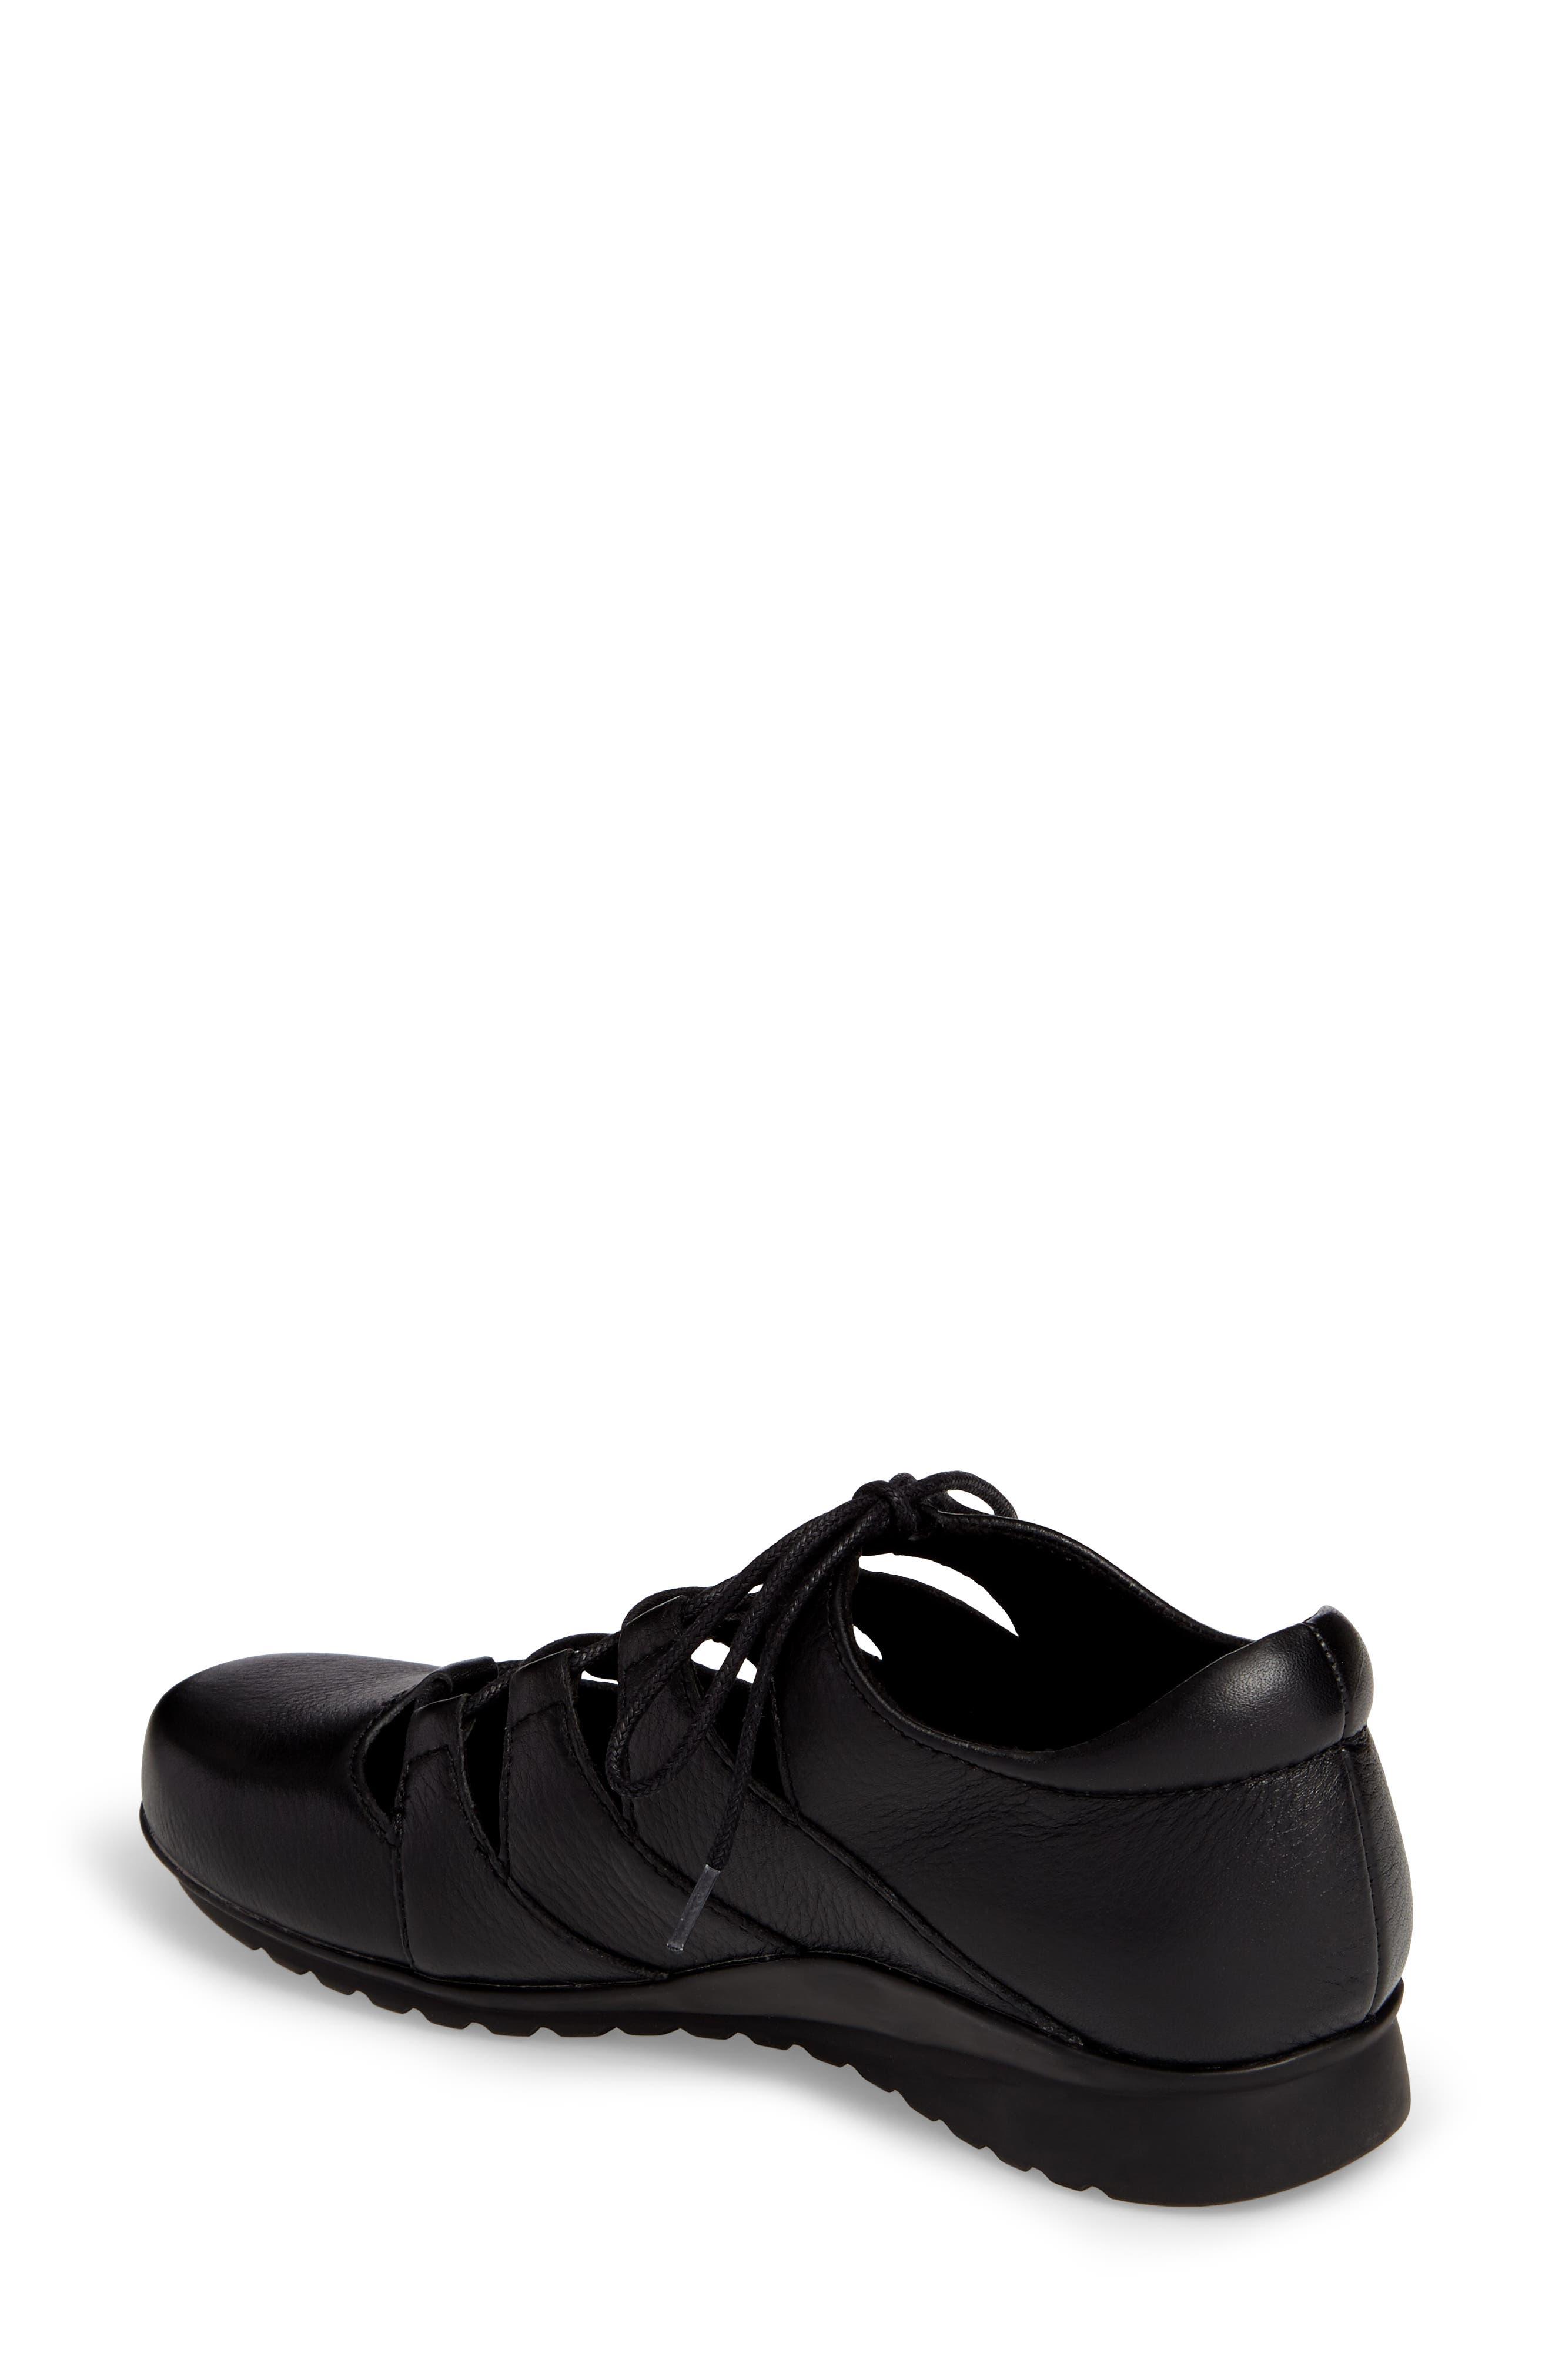 Sienna Cutout Sneaker,                             Alternate thumbnail 2, color,                             BLACK LEATHER/ BLACK